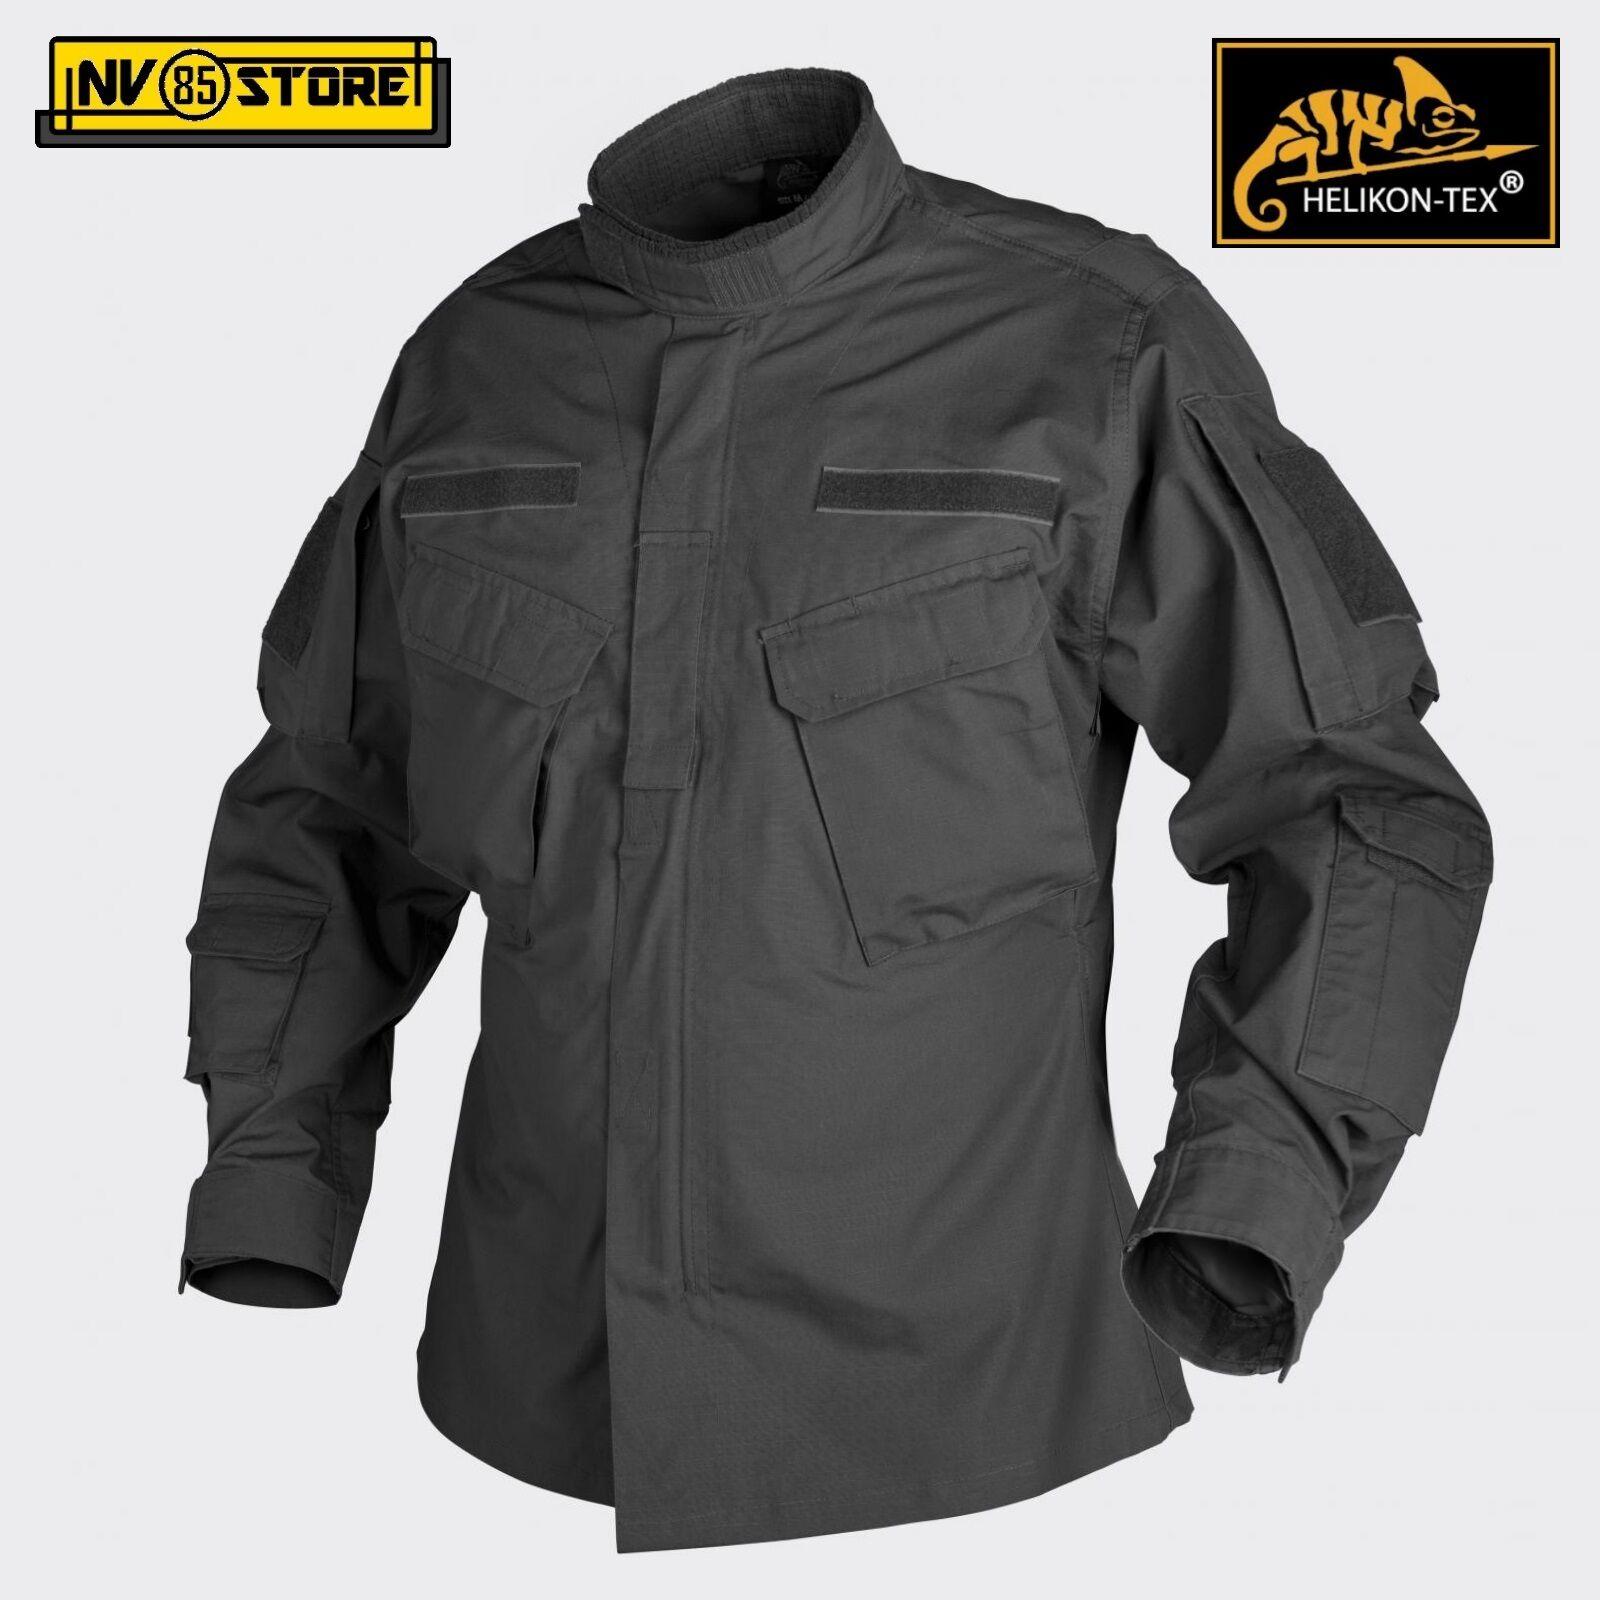 CPU Jacket HELIKON-TEX Tattica Giacca Tattica HELIKON-TEX Combat Shirt Softair Militare Outdoor BK c6b081